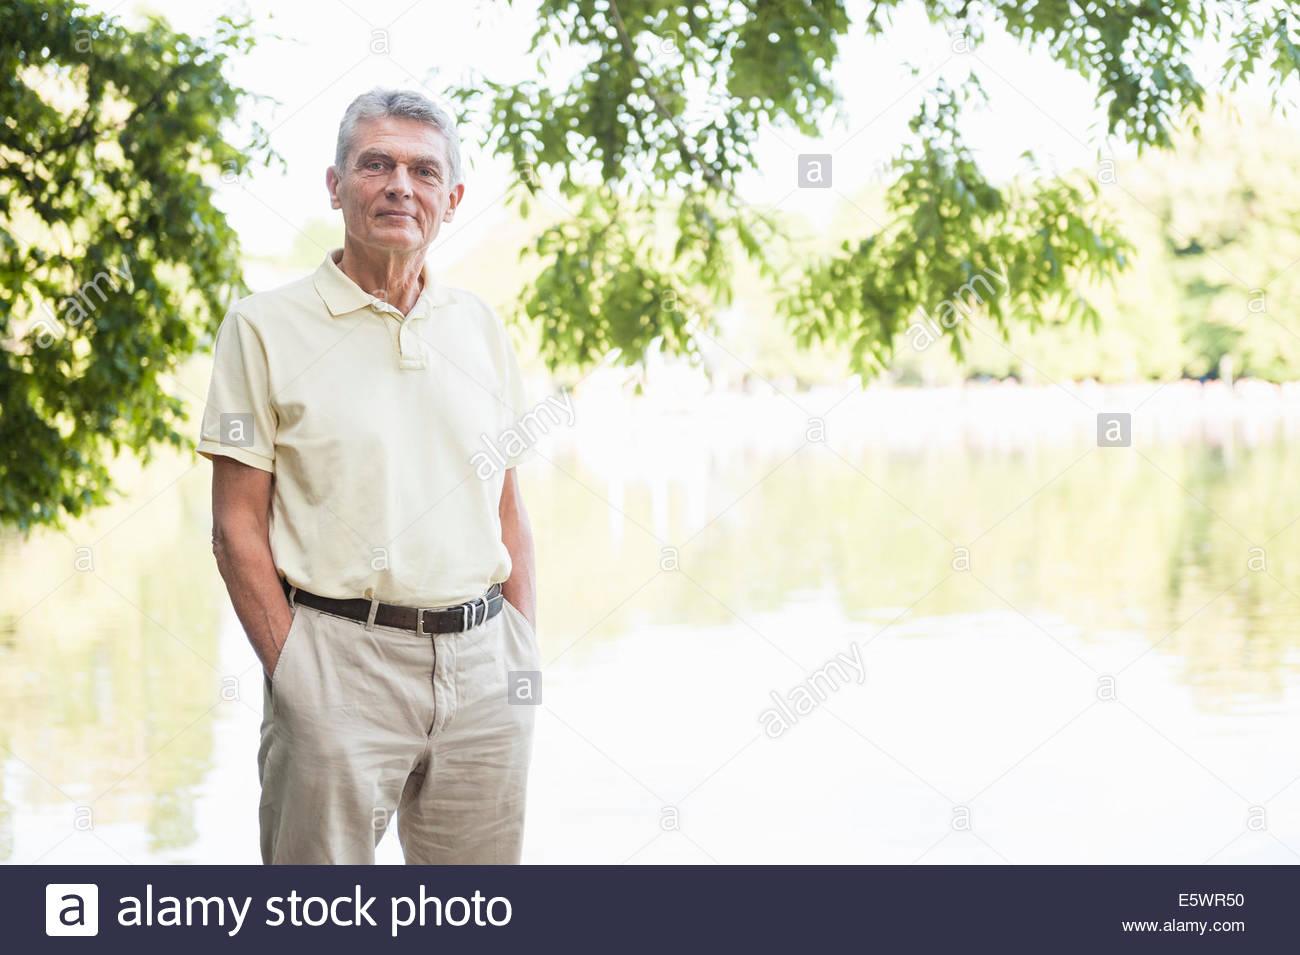 Portrait of senior adult man - Stock Image